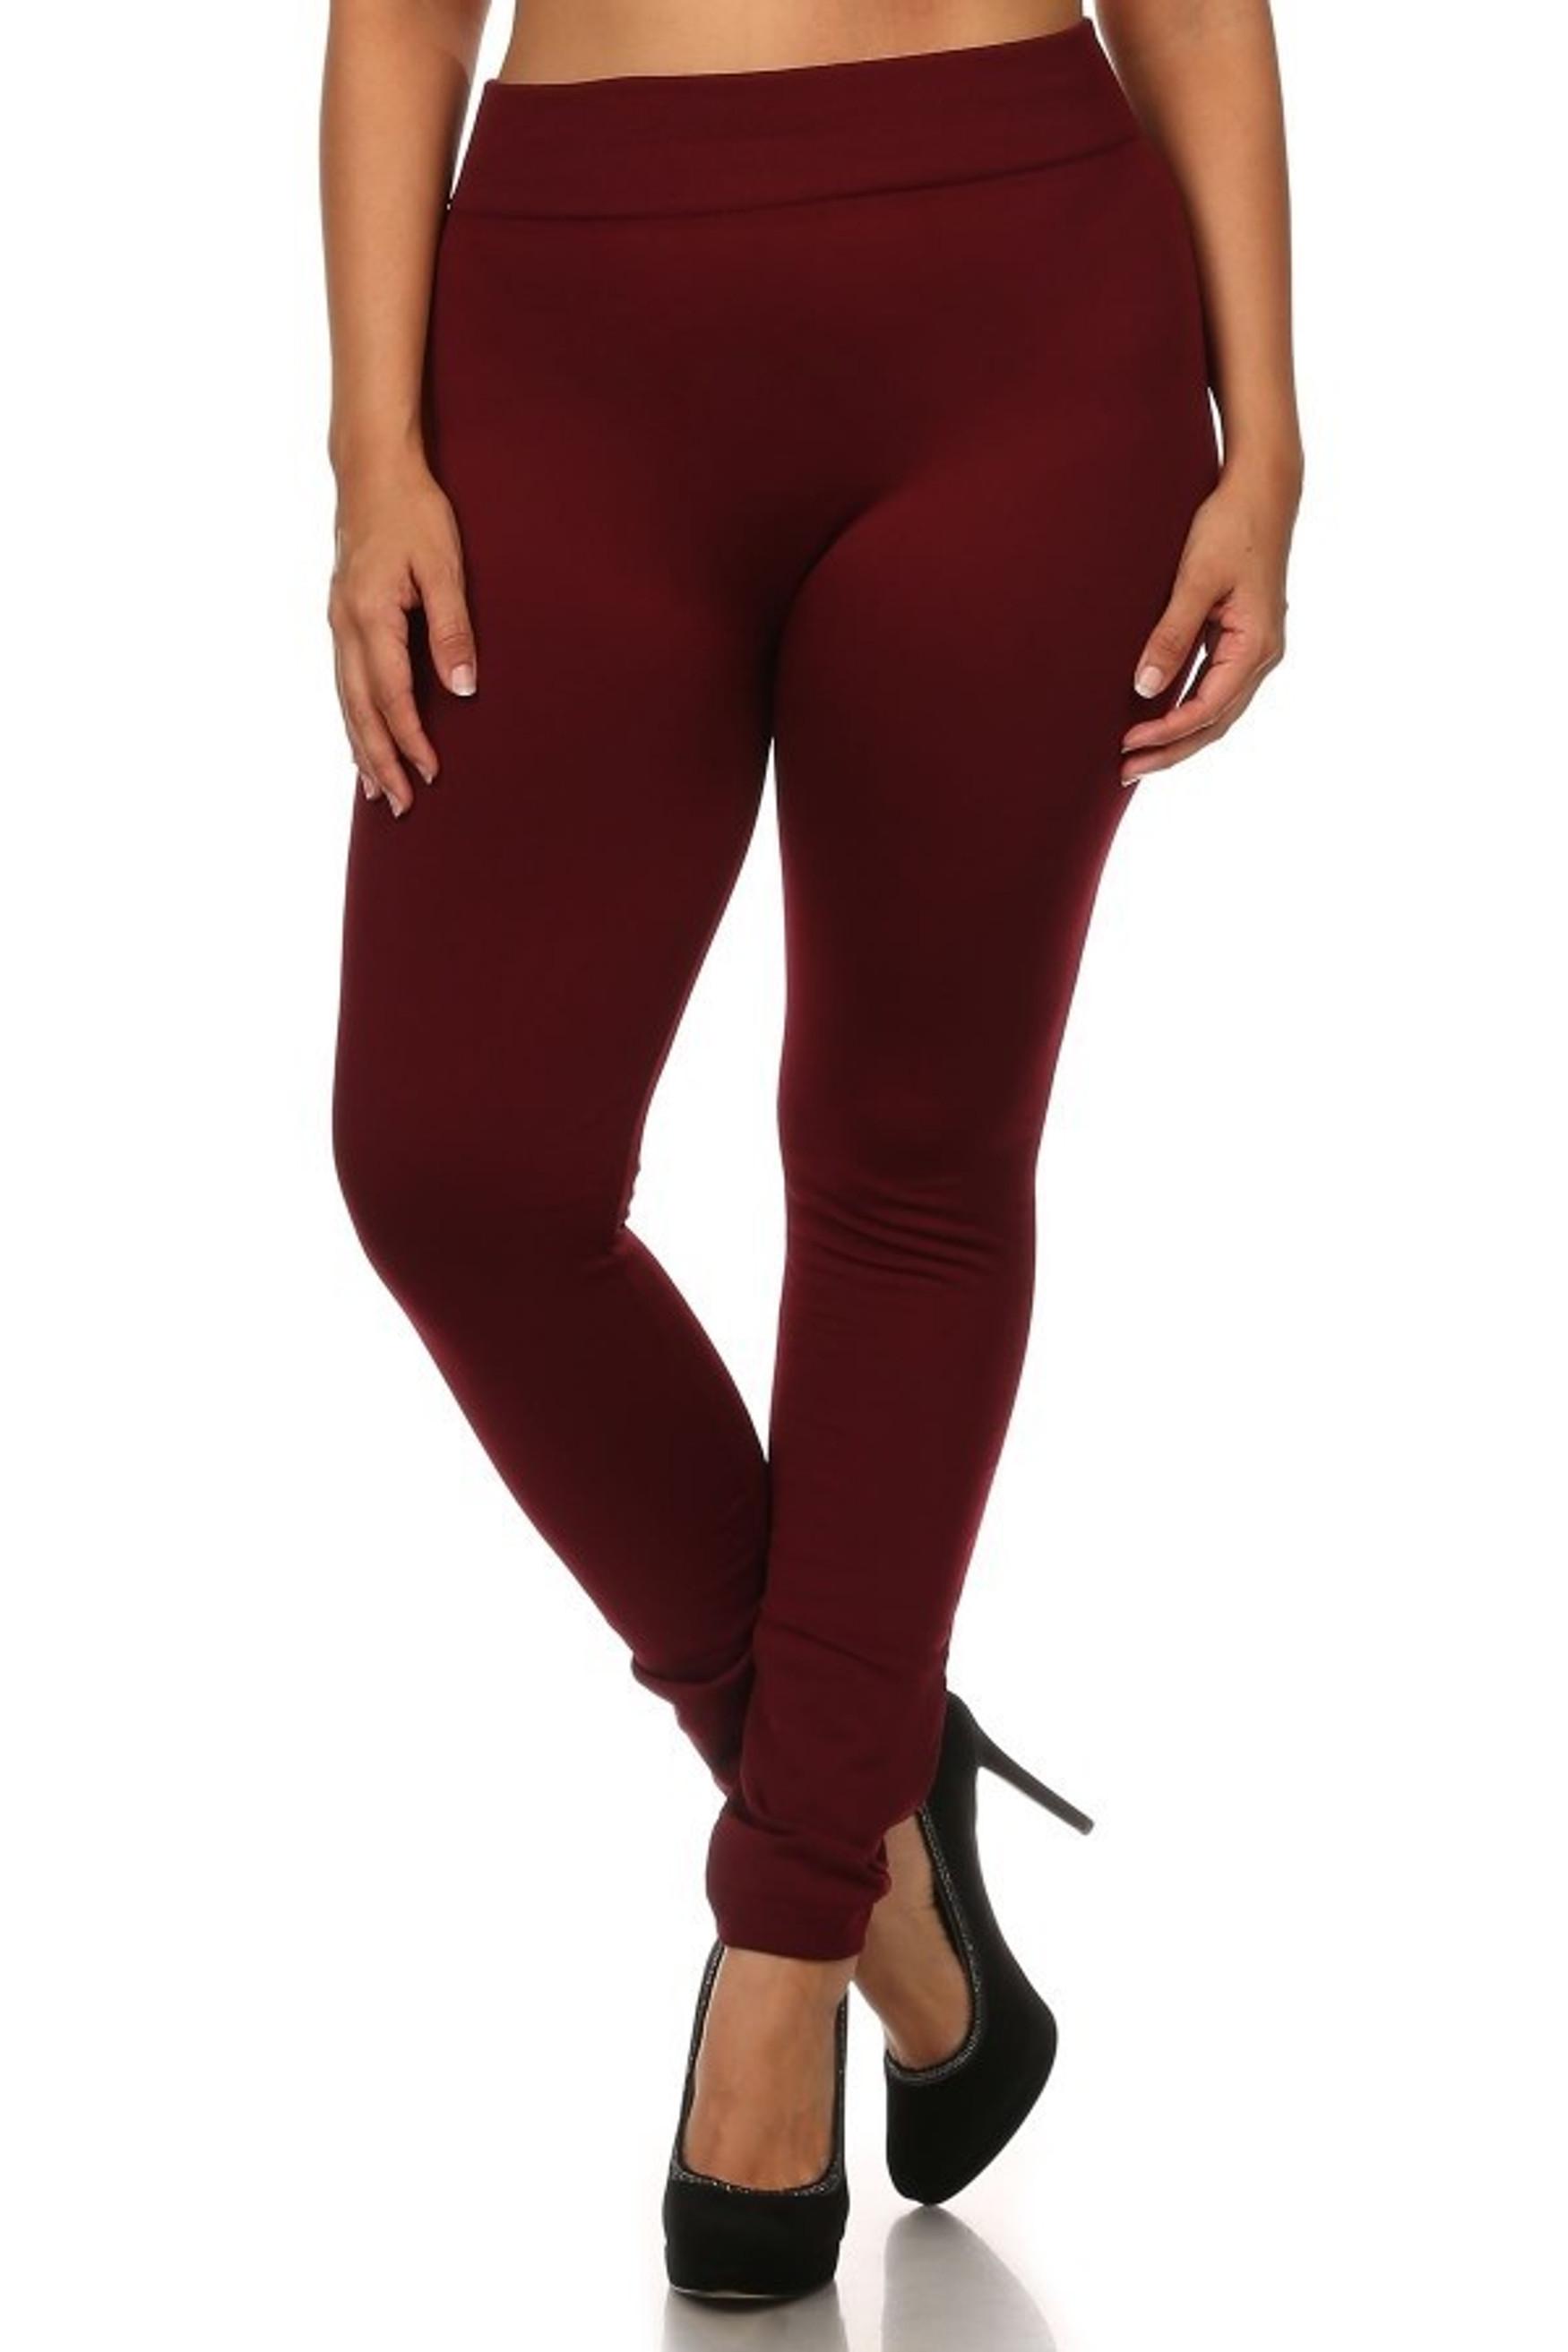 Front image of Premium Women's Fleece Lined Plus Size Leggings